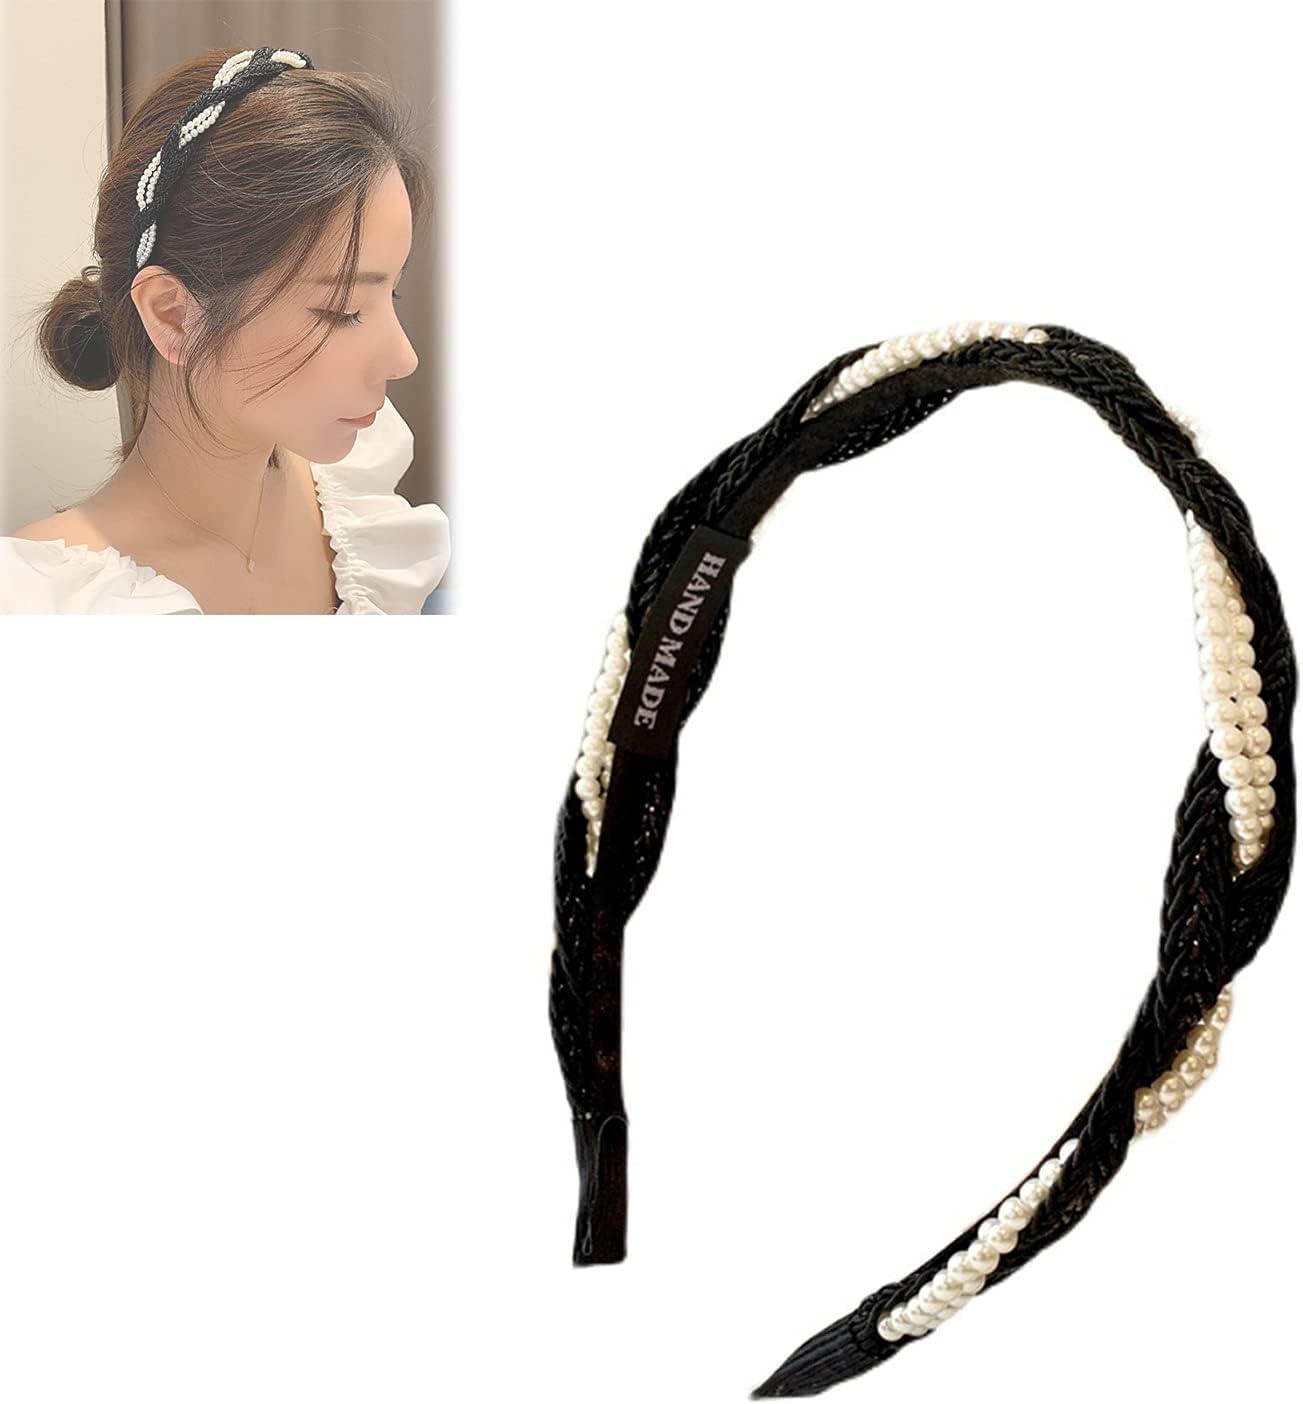 XFSSFWB Korean Style Elegant Braided Bangs Holder, Pearl Headbands for Women, Handmade Braided Hair Accessories for Women Girls (Color : Black)